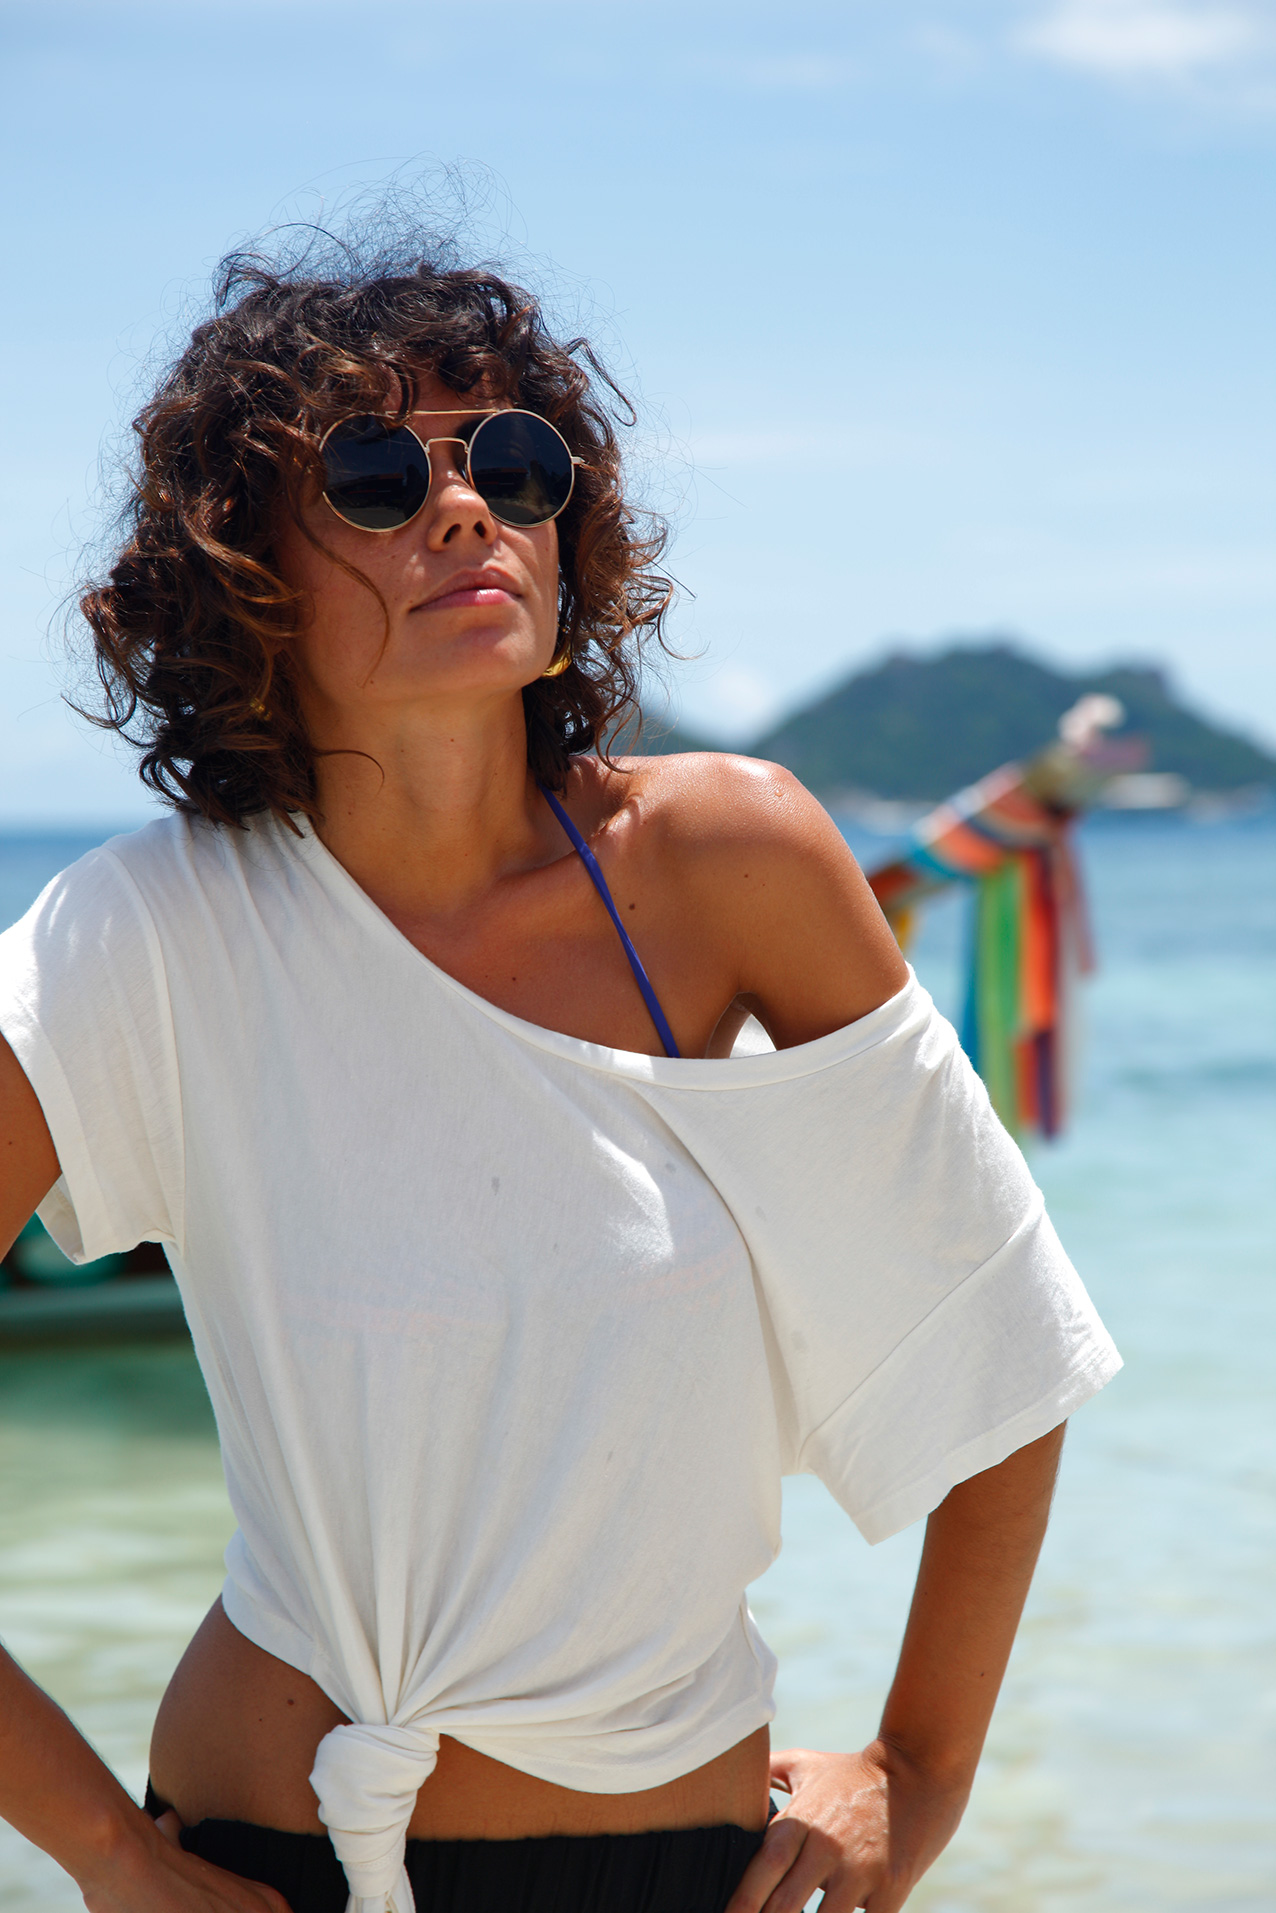 Beach_outfit-Polin_et_moi-shorts-streetstyle-cool_lemonade